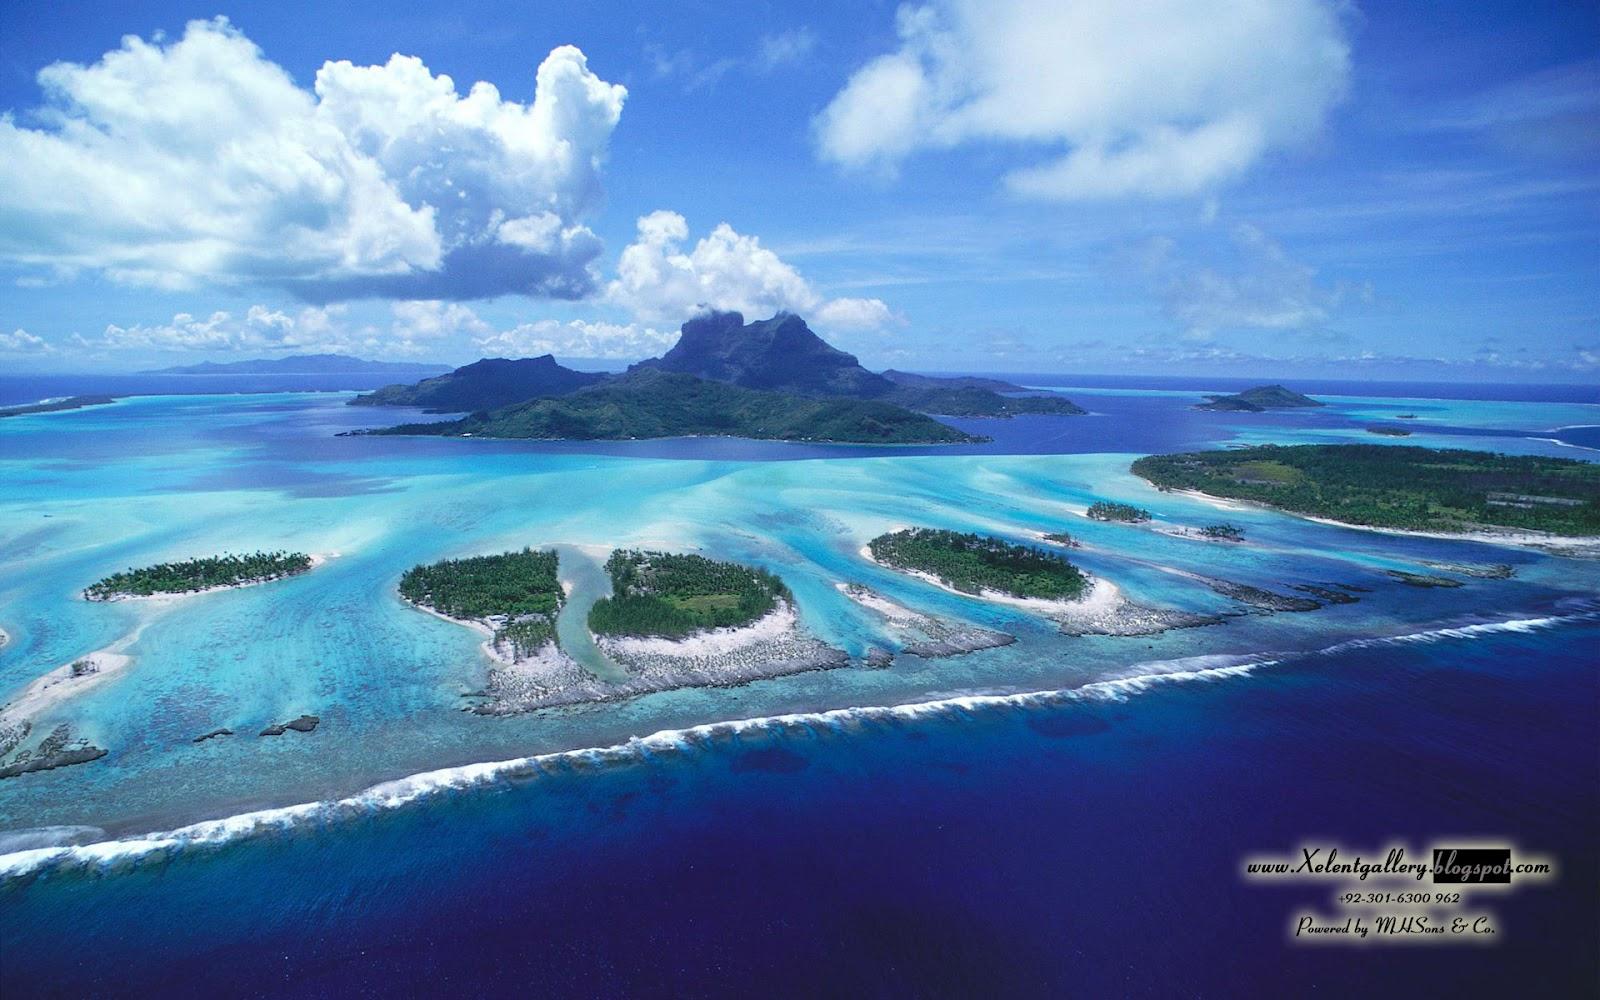 http://2.bp.blogspot.com/-OOayEzbhJtk/T99QDp_N63I/AAAAAAAAByQ/_VnNXrJEzcM/s1600/Amazing+Island+Wallpapers+%252840%2529.JPG